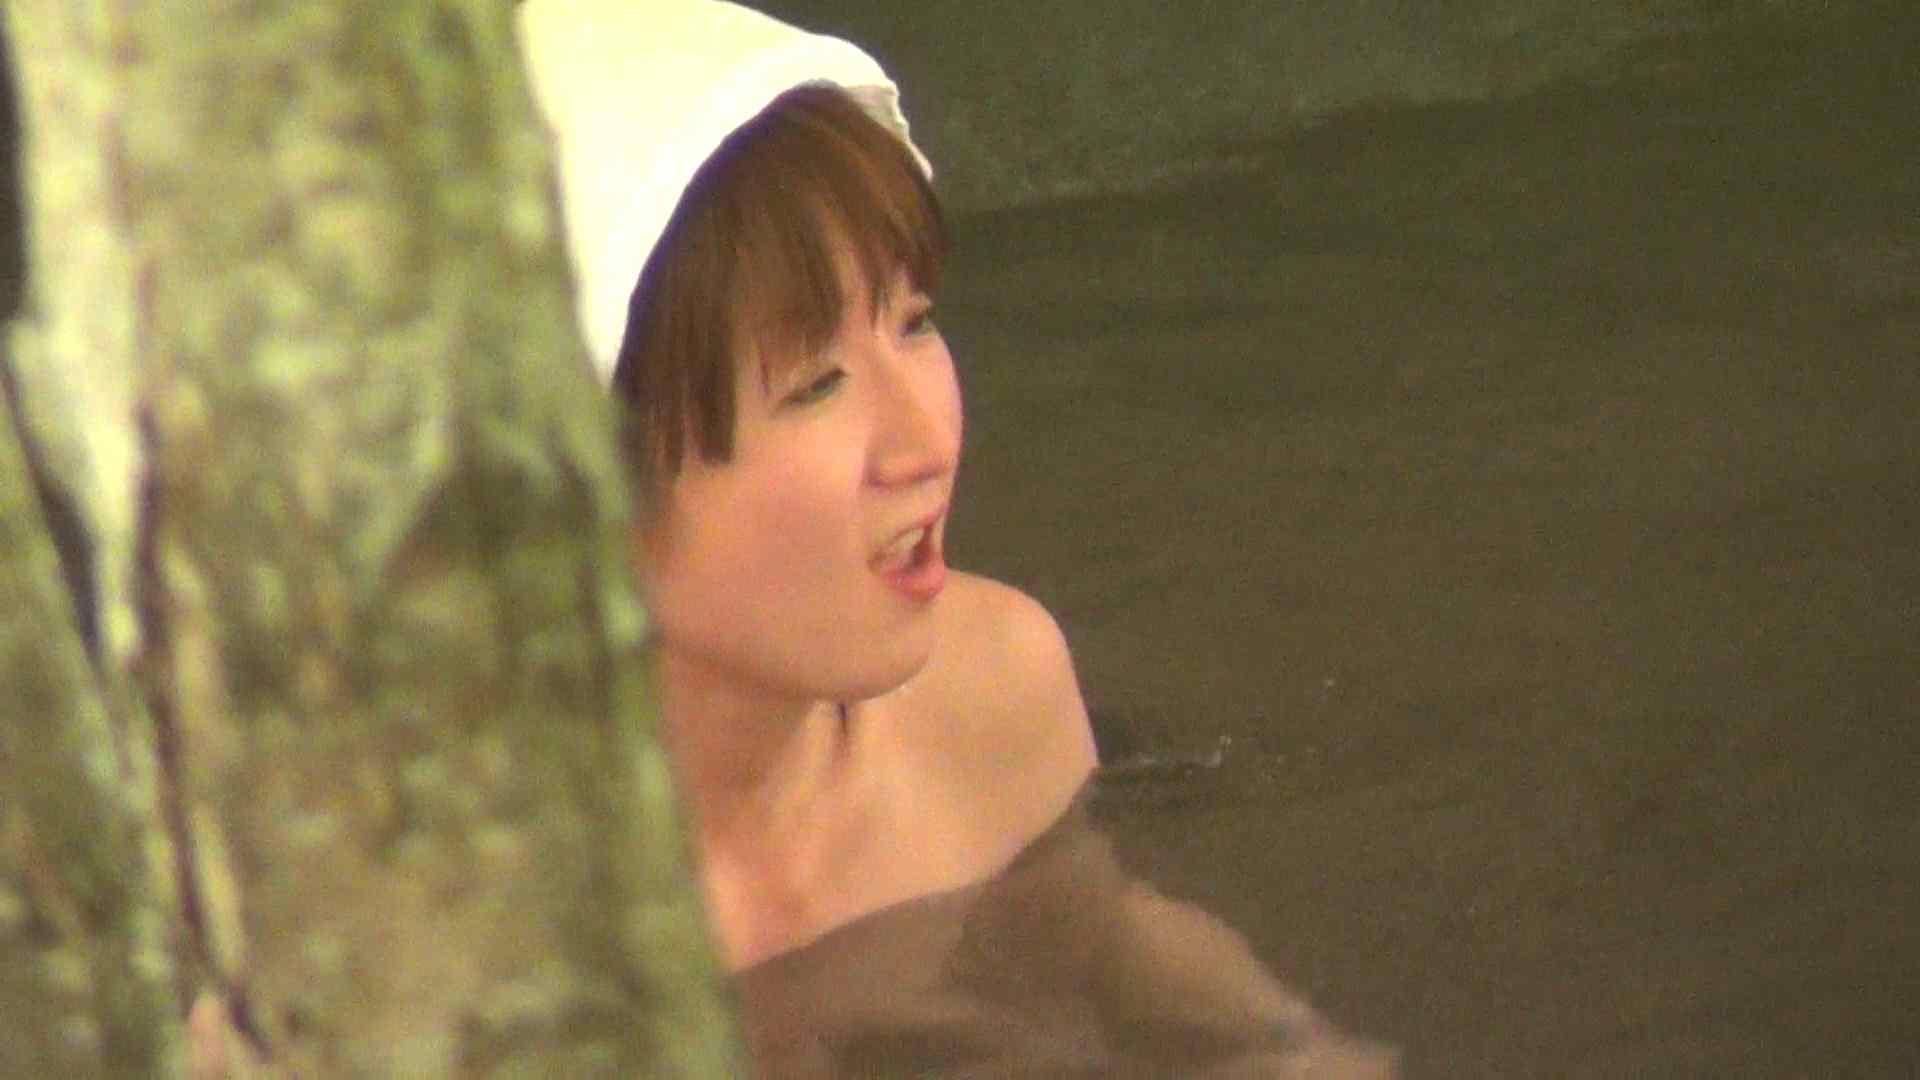 Aquaな露天風呂Vol.251 露天   HなOL  76pic 72